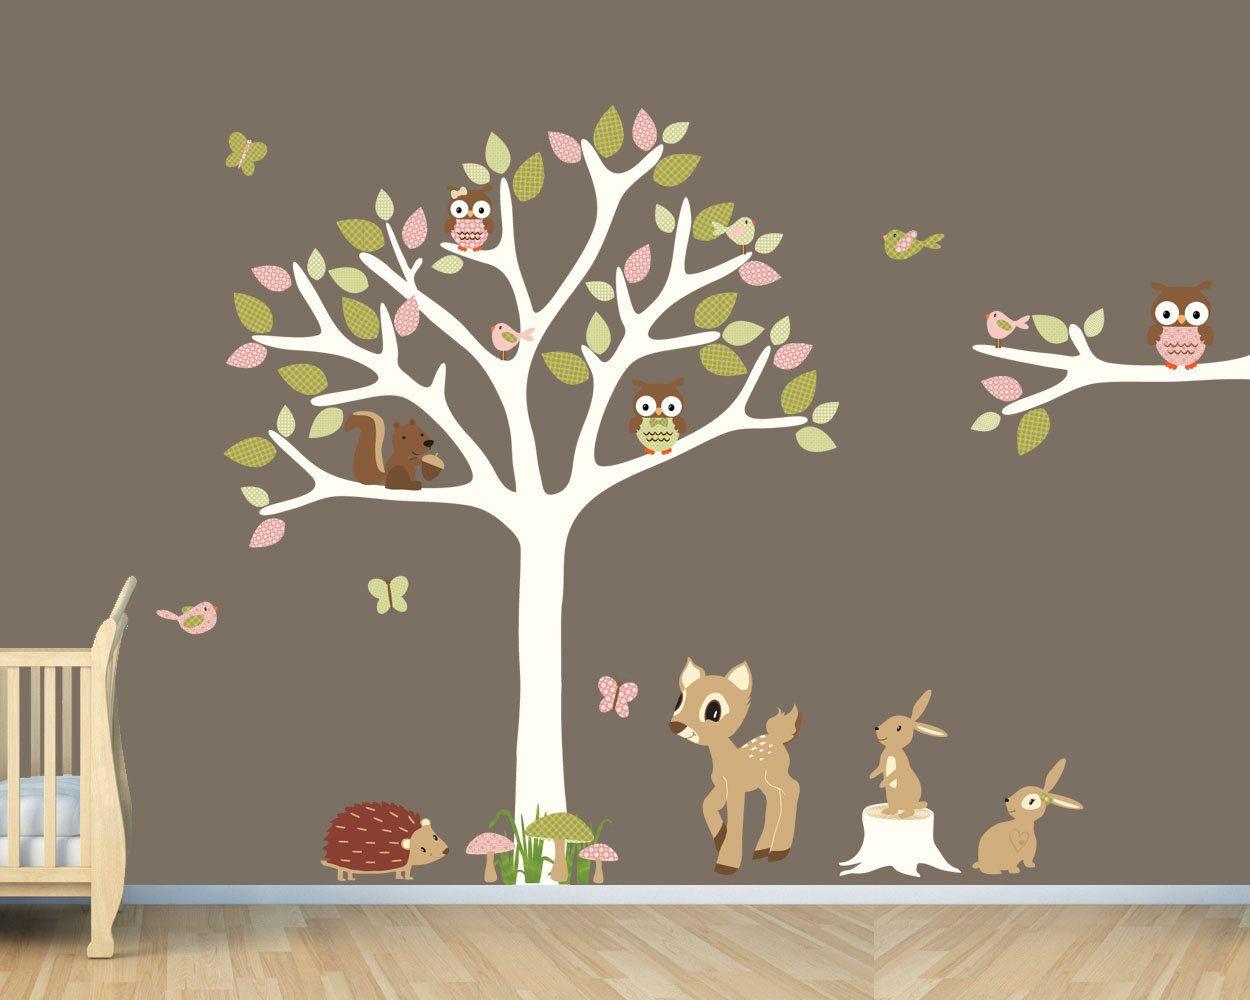 Owl Tree Forest Animals Woodland Nursery Wall